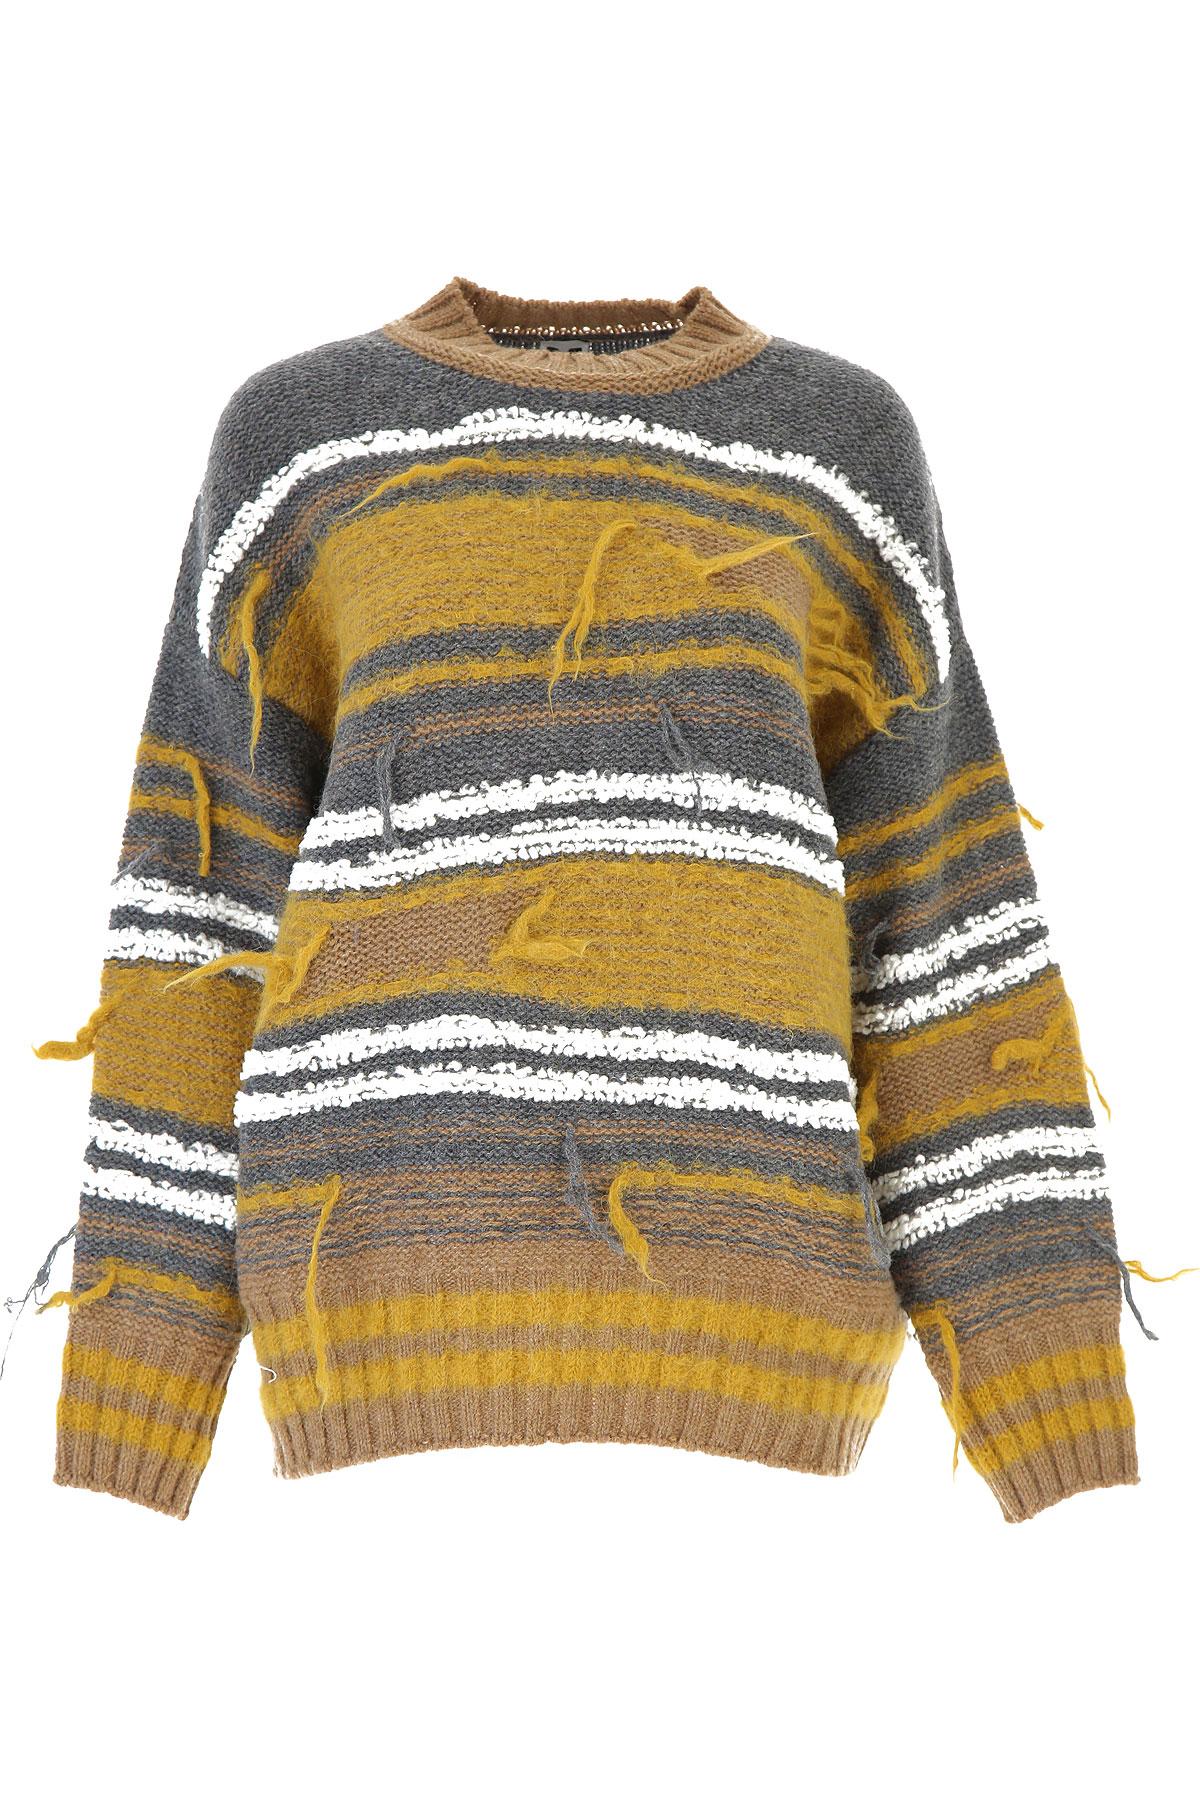 Missoni Sweater for Women Jumper On Sale, Medium Grey, Wool, 2019, 2 4